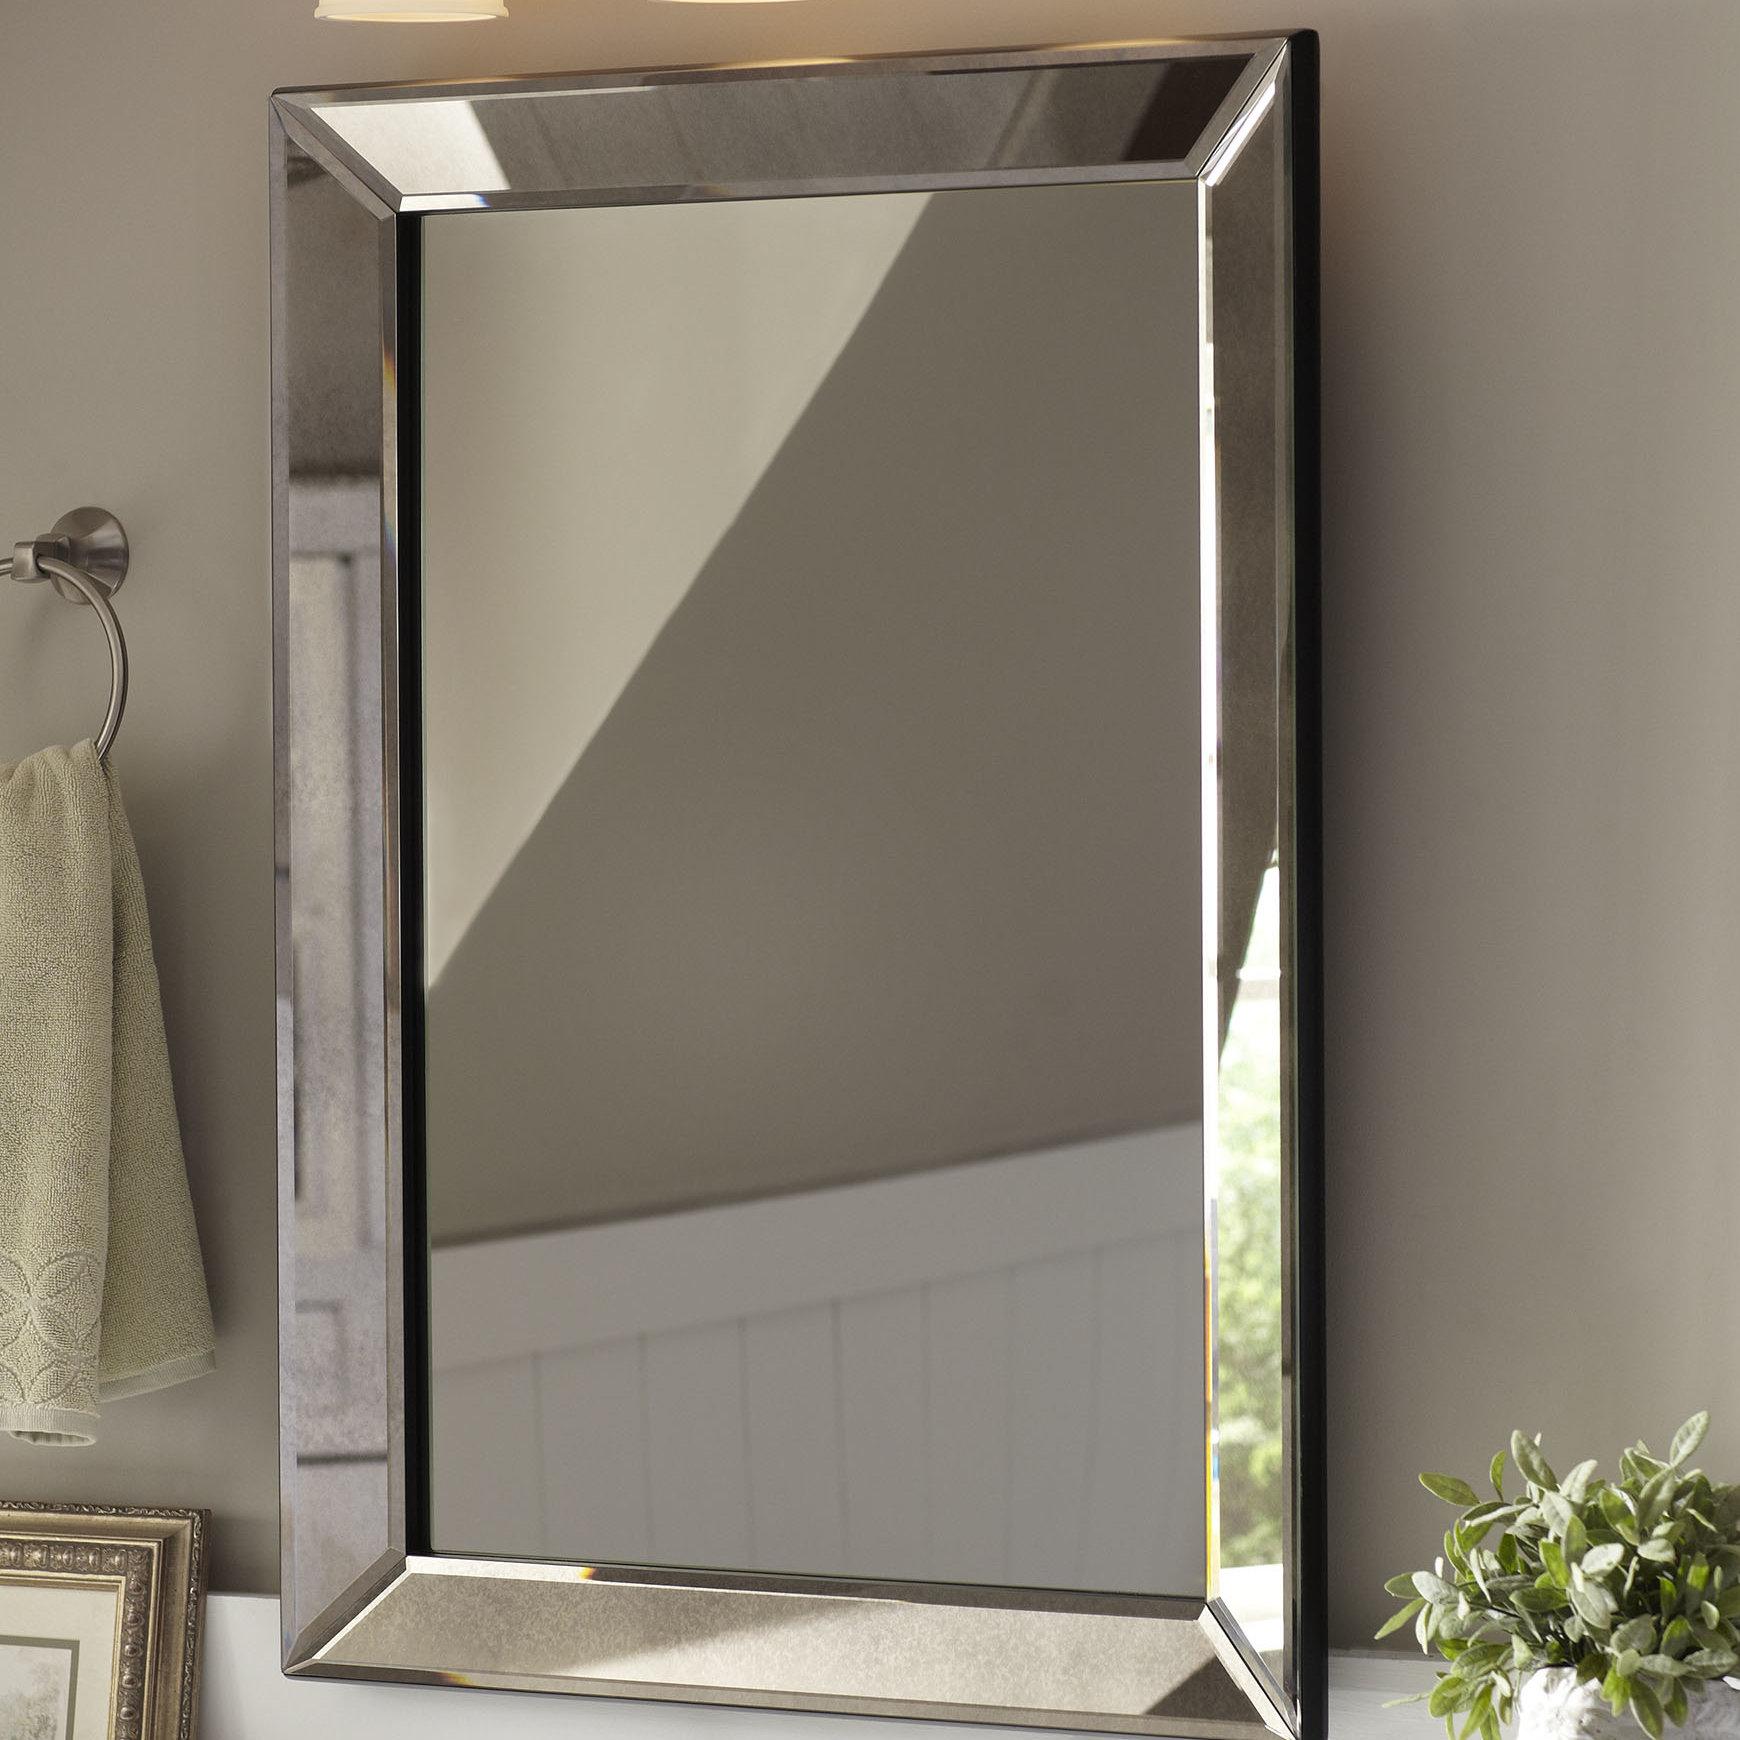 Birch Lane™ Heritage Ansgar Accent Mirror Regarding 2 Piece Priscilla Square Traditional Beveled Distressed Accent Mirror Sets (View 11 of 20)